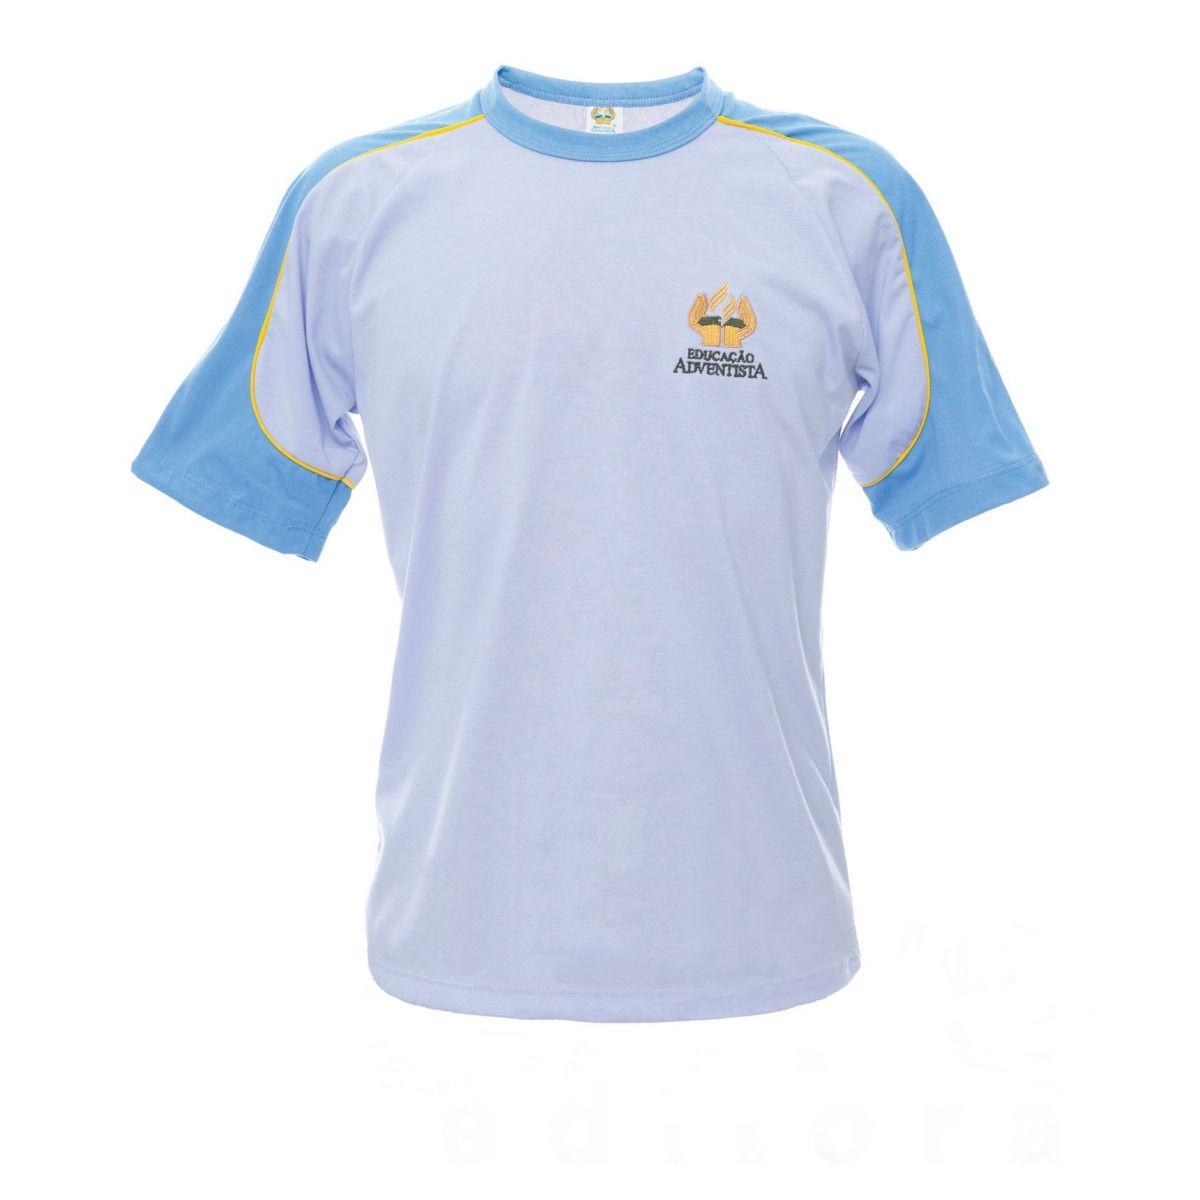 Camiseta Manga Curta - GA ( 50-52 )